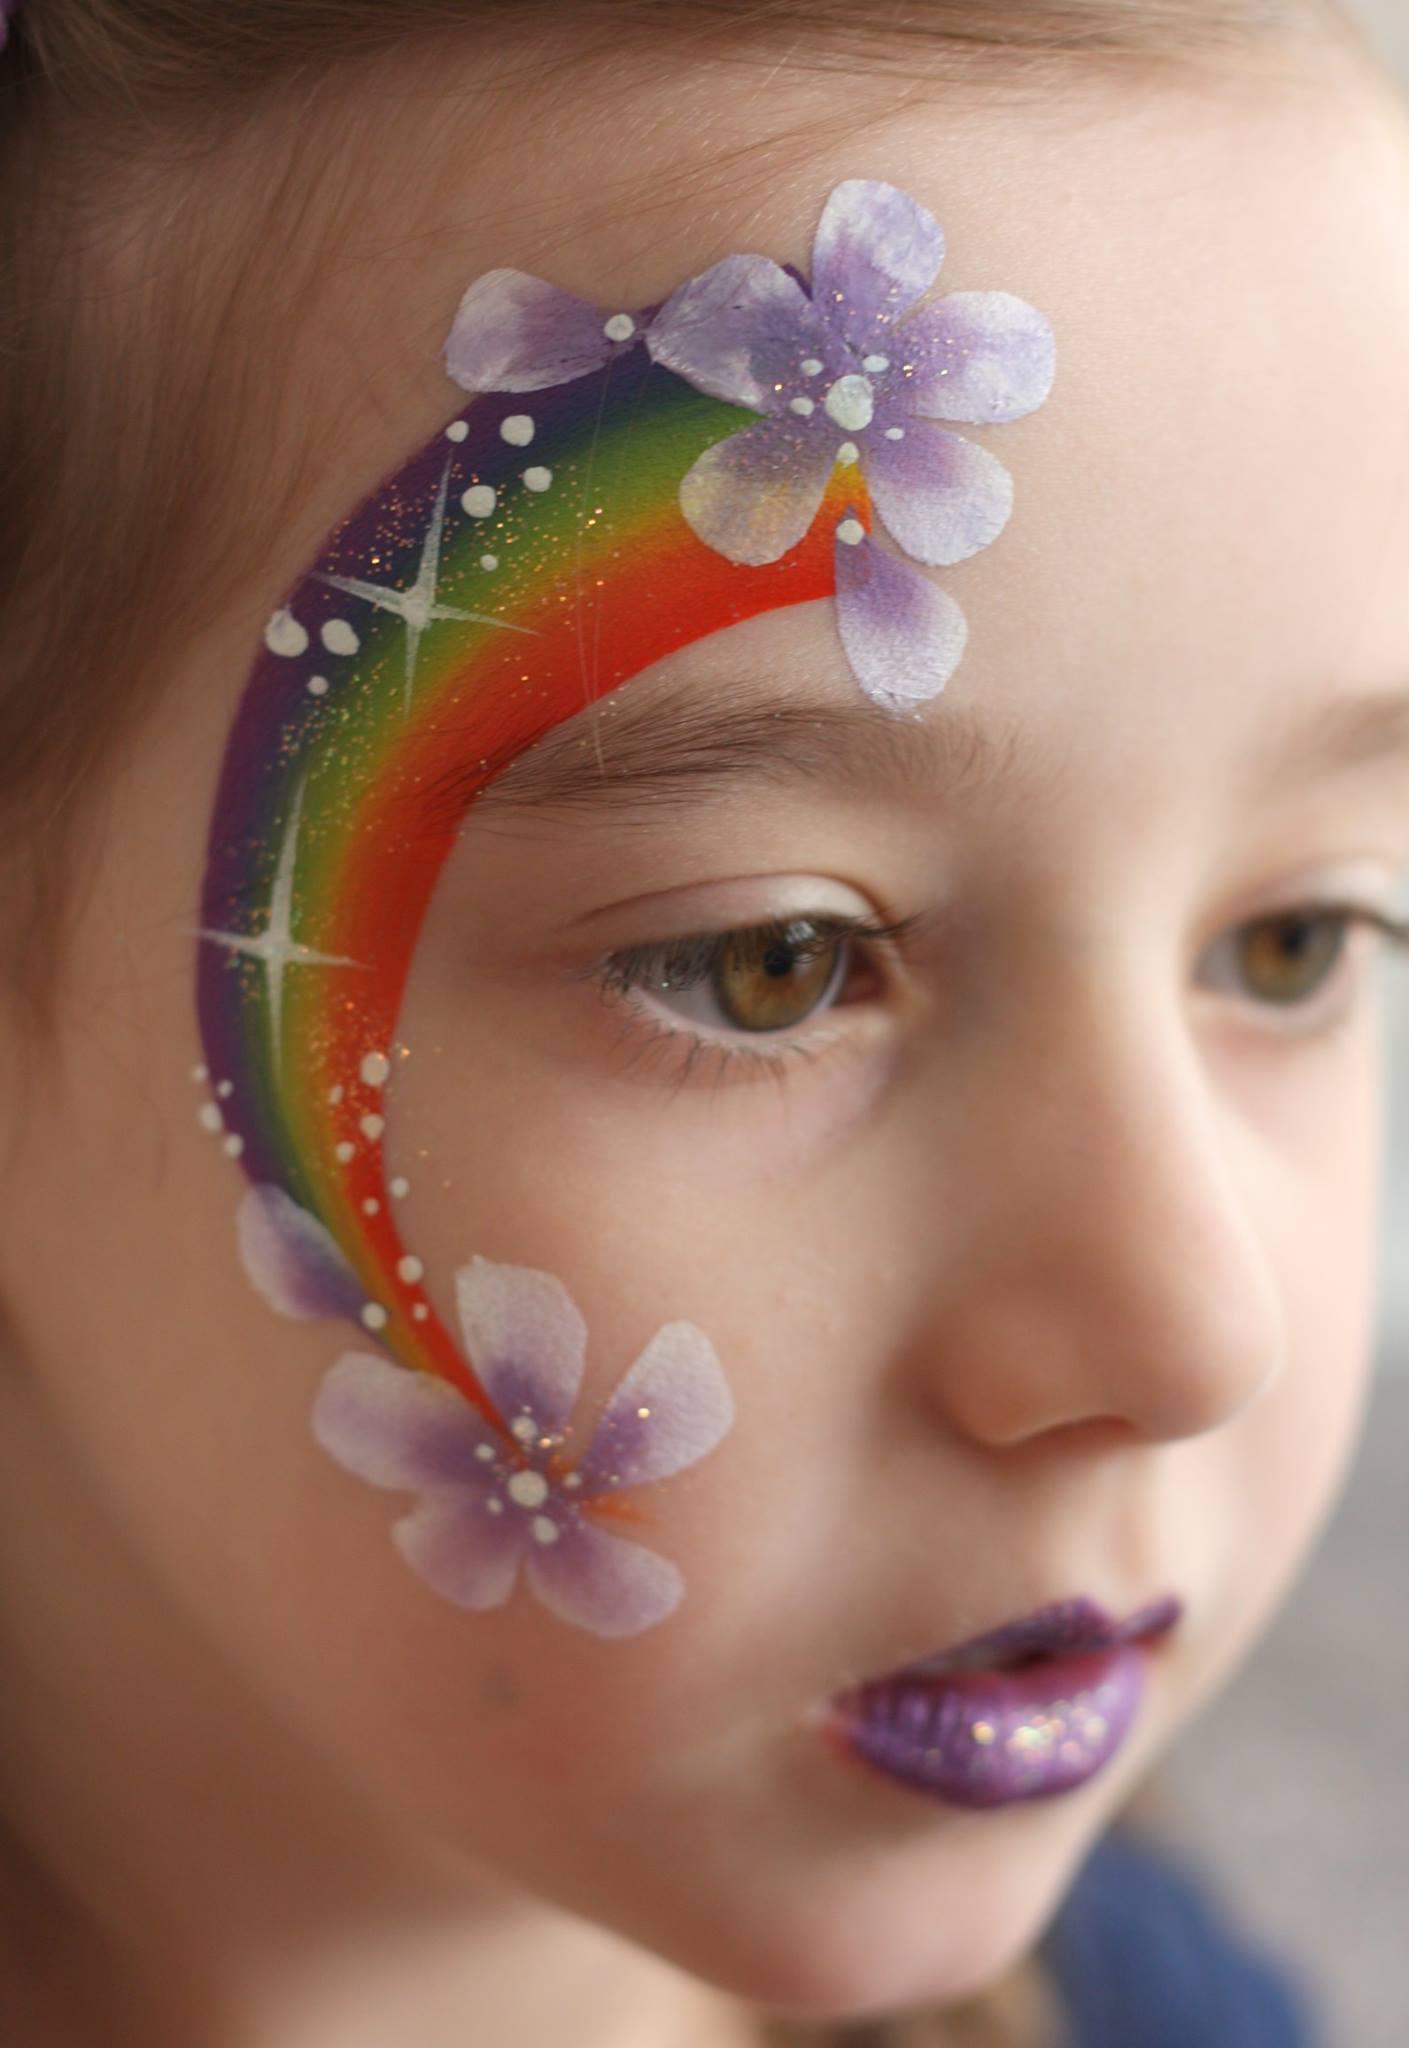 Nadine's Dreams Face Painting - Calgary Face Painter ...